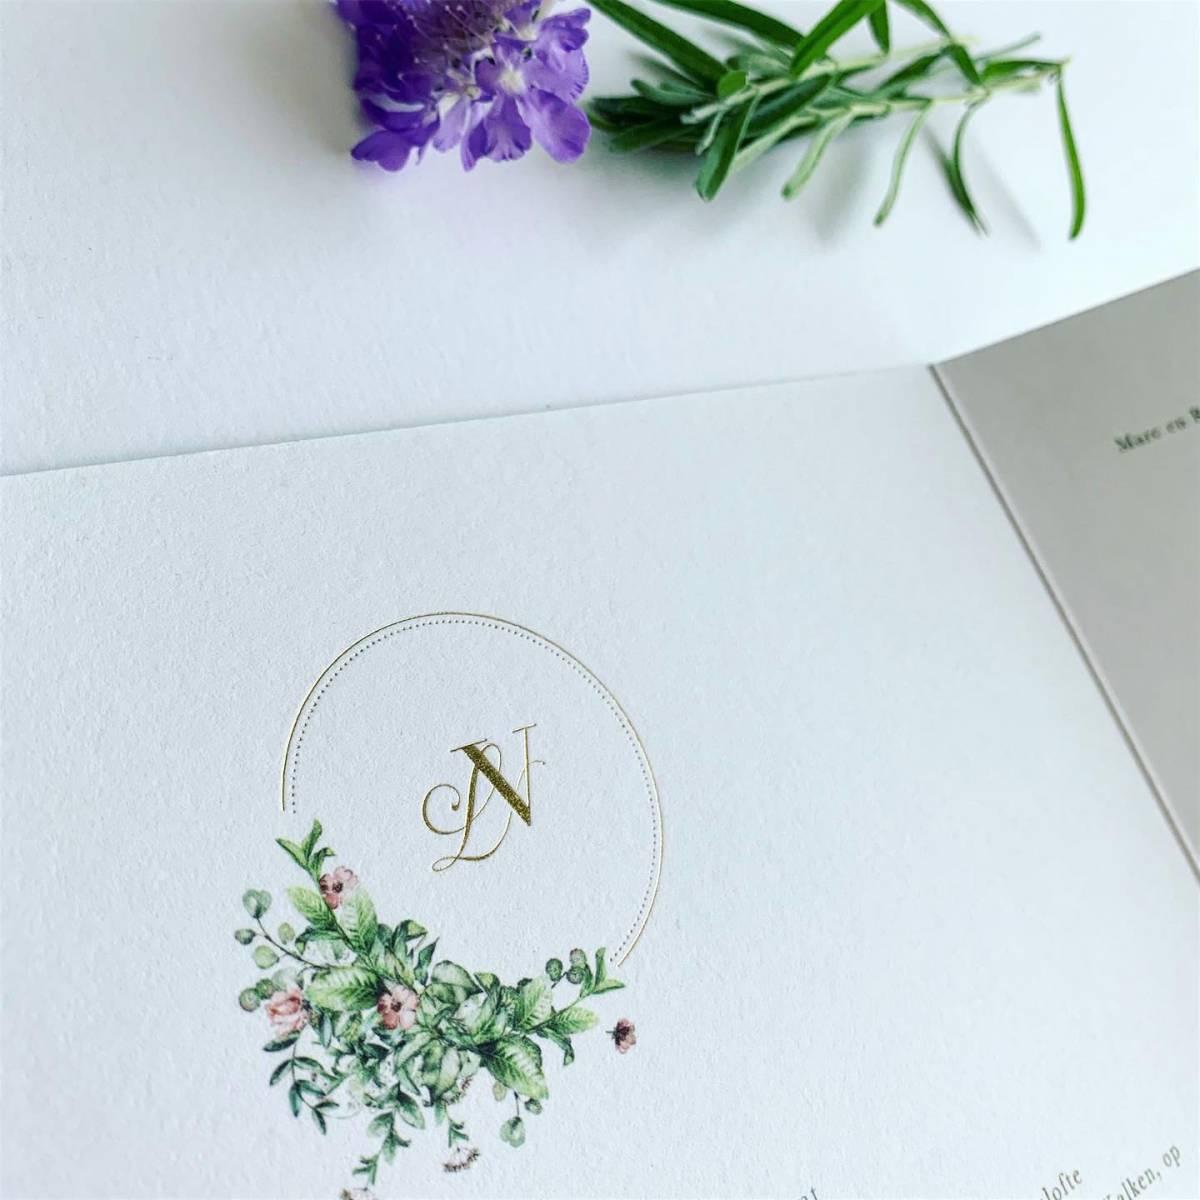 Scarabar - Trouwuitnodiging - Huwelijksuitnodiging - Drukwerk - Huwelijk - Trouw - Bruiloft - House of Weddings - 35